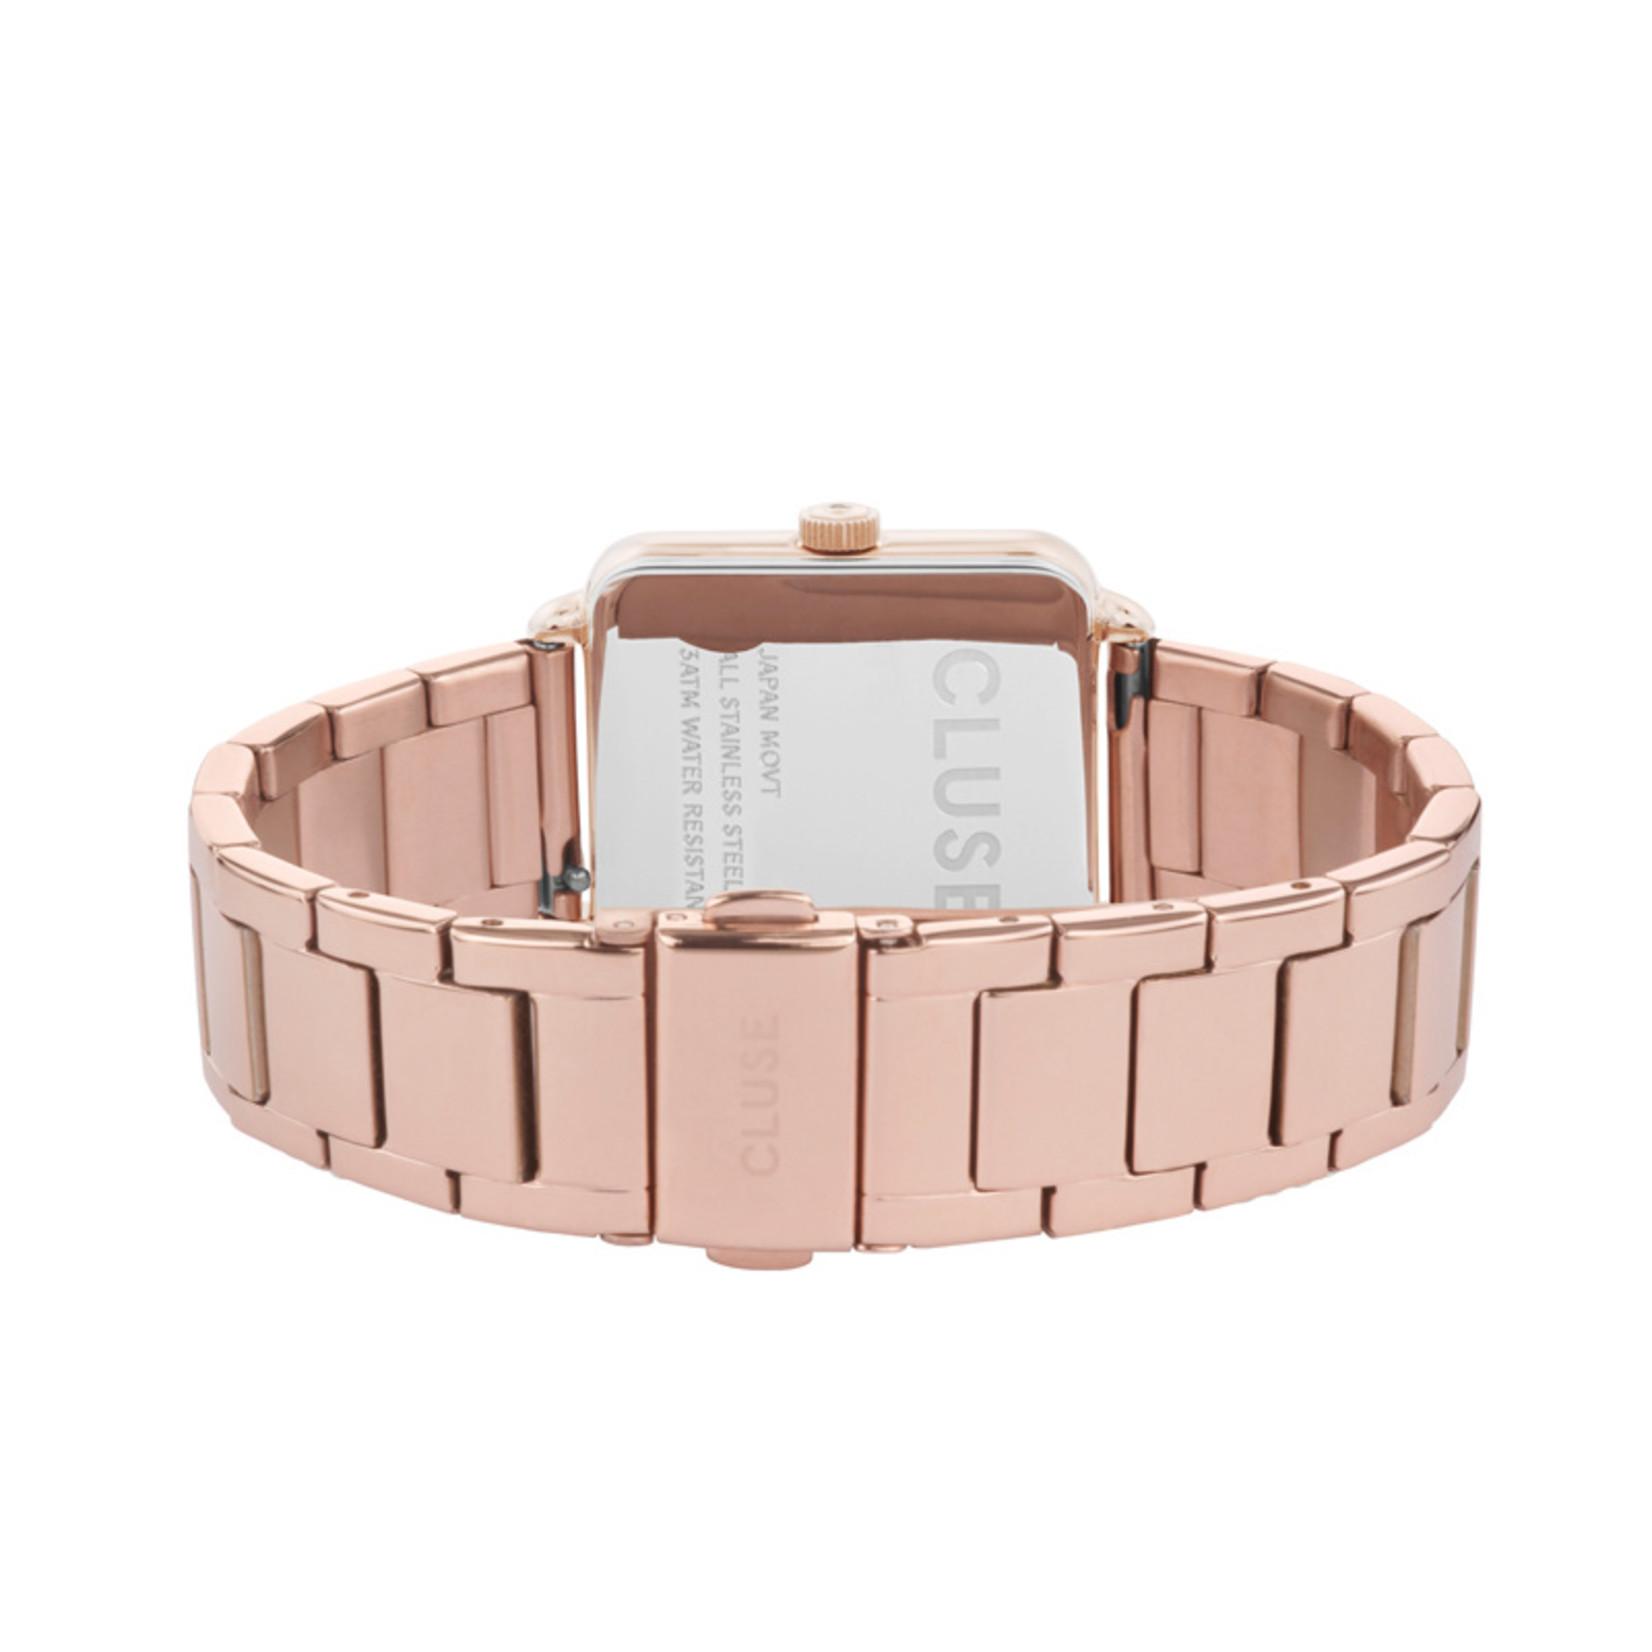 Cluse Cluse Uhr La Tétragone Three Link I roségold-weiß I rechteckig